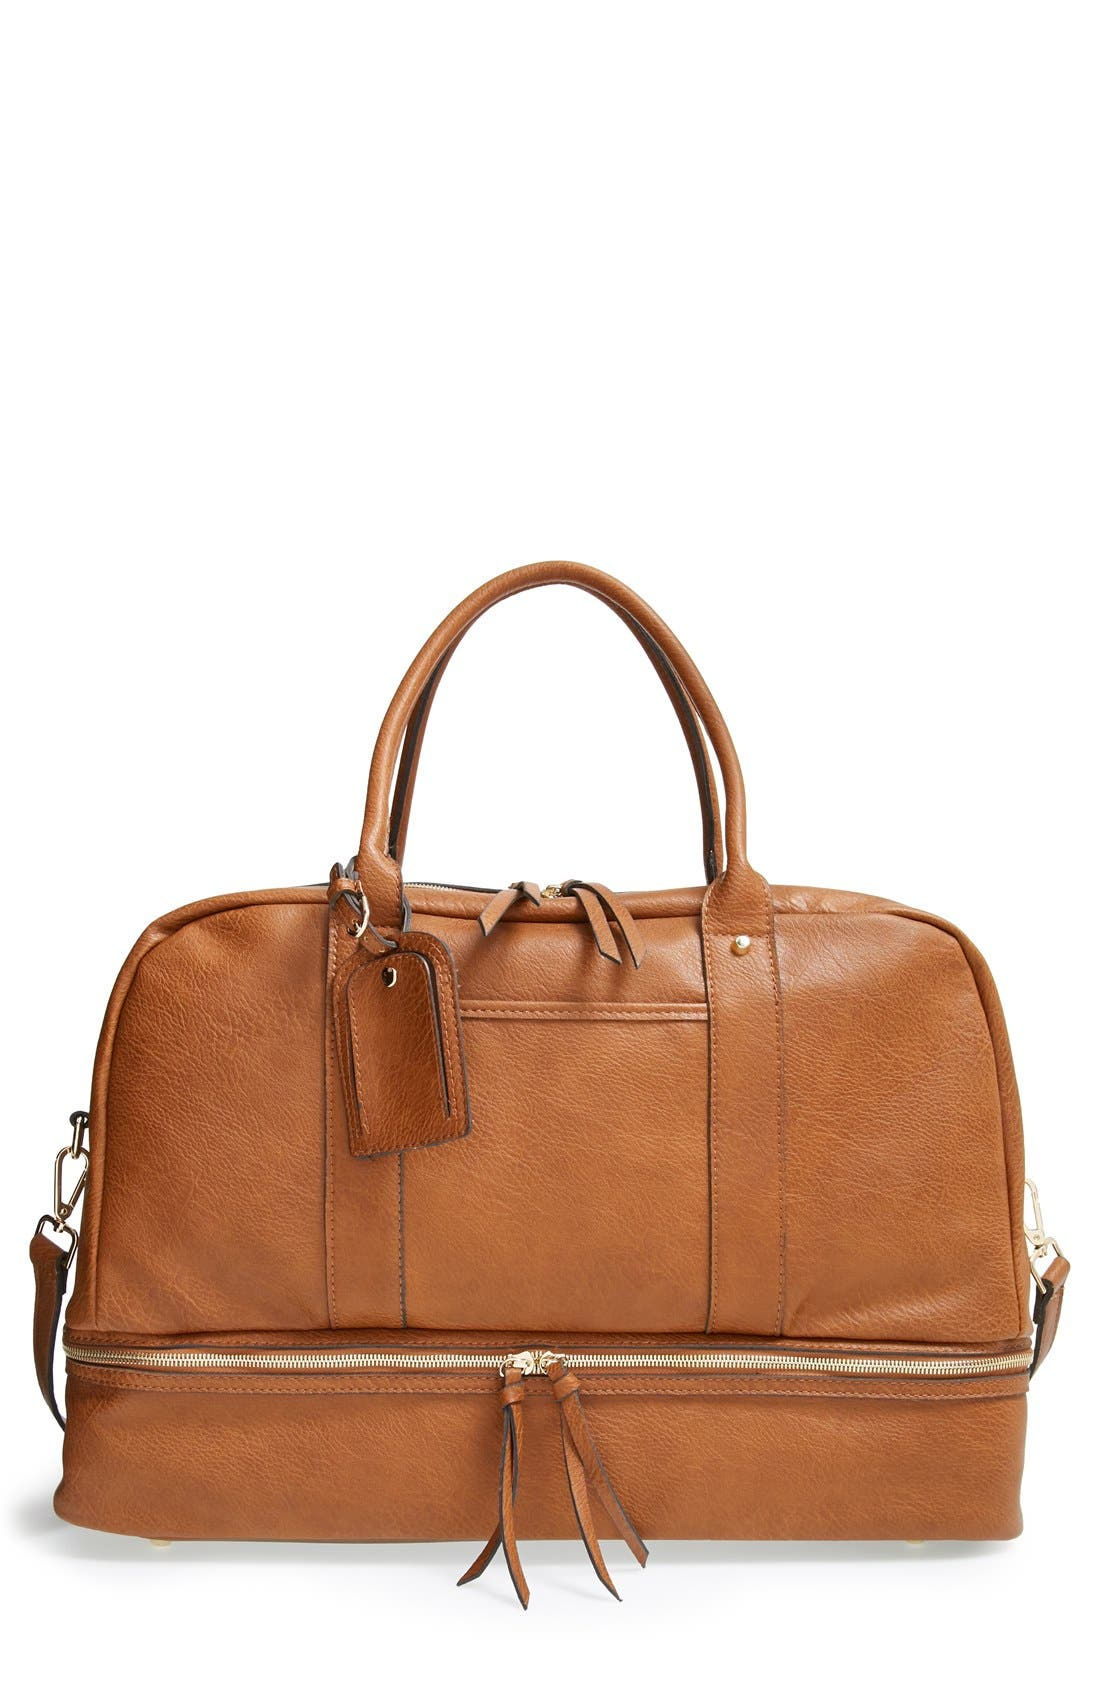 Mason Weekend Bag,                         Main,                         color, COGNAC